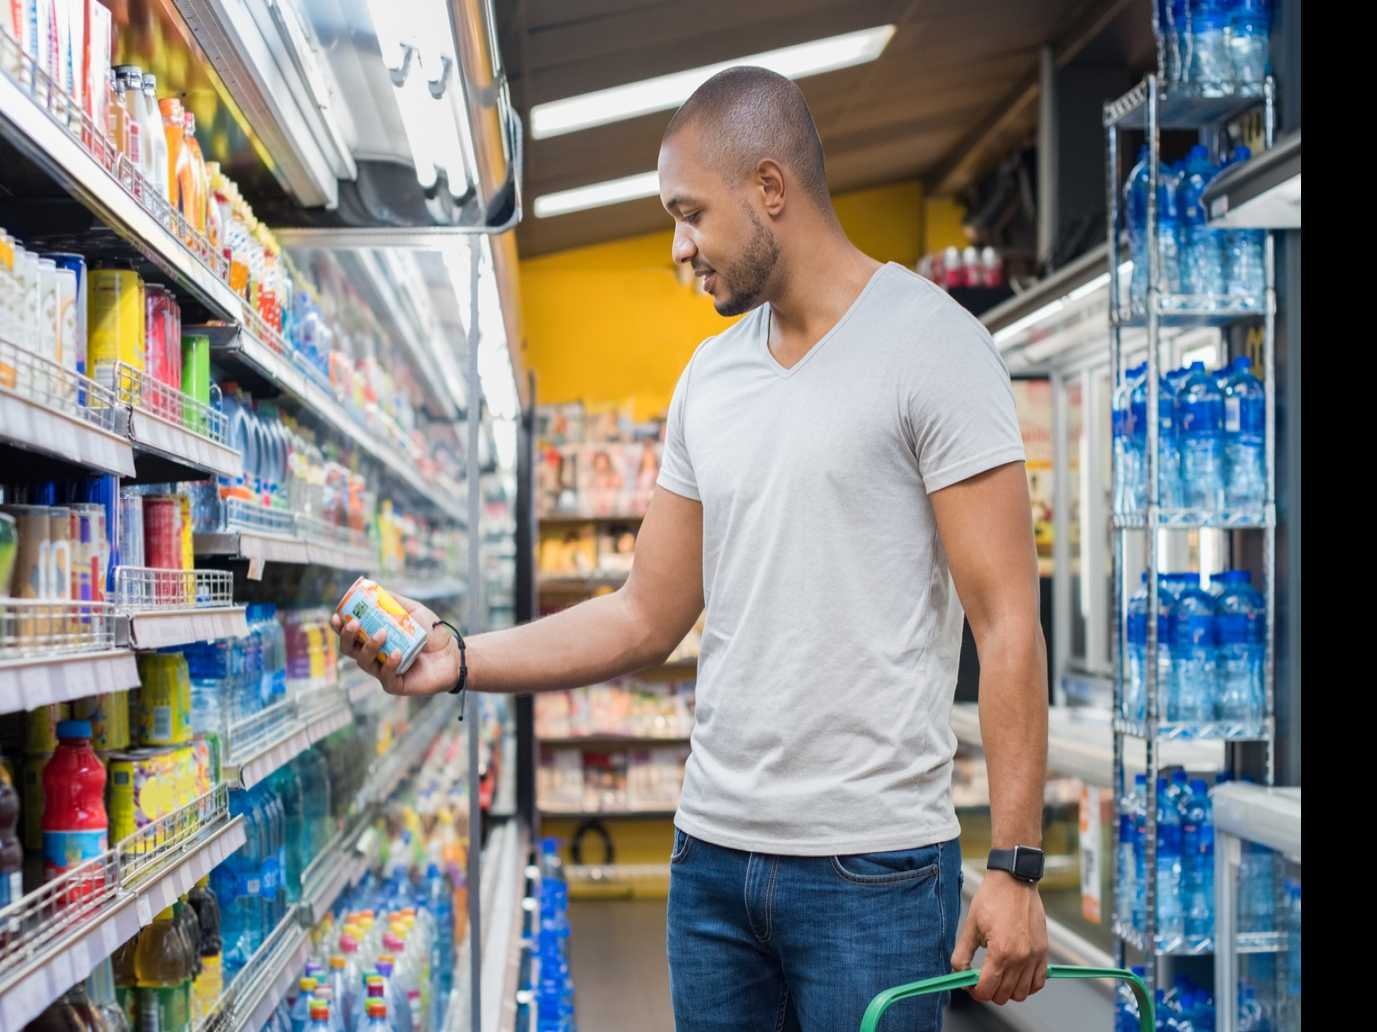 Despite Health Concerns, USDA Decides to Allow Carrageenan in Organic Food